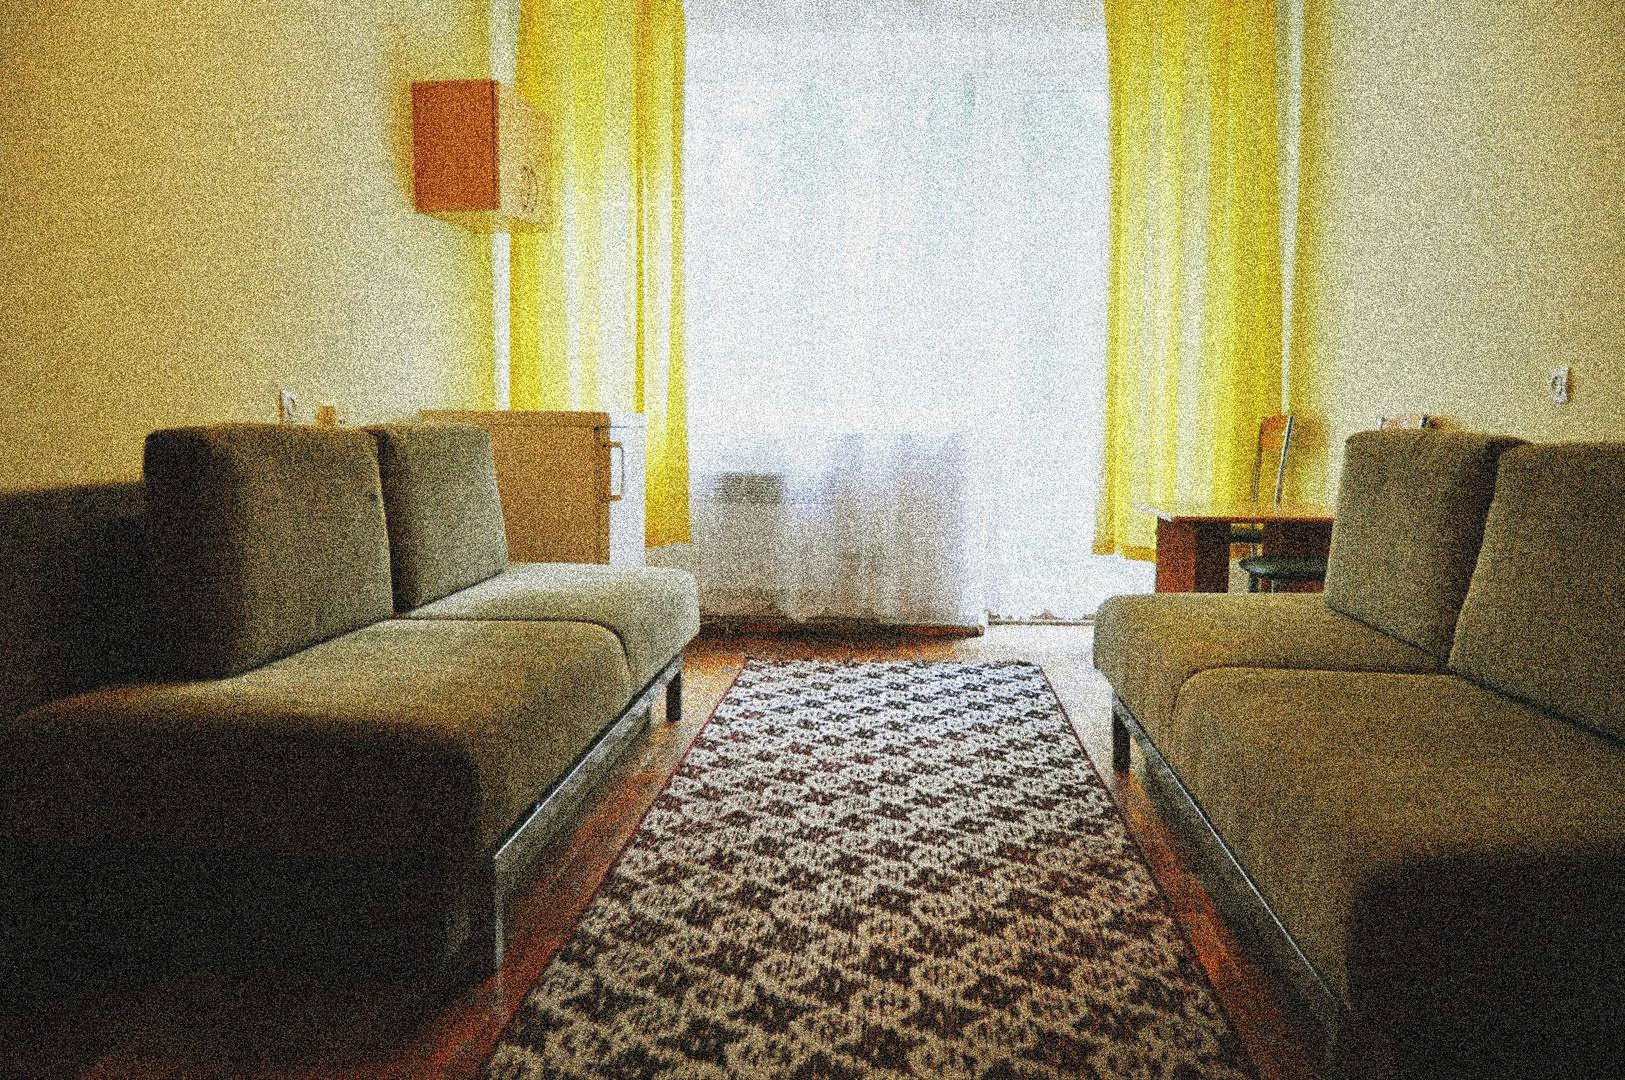 kambarys.jpg